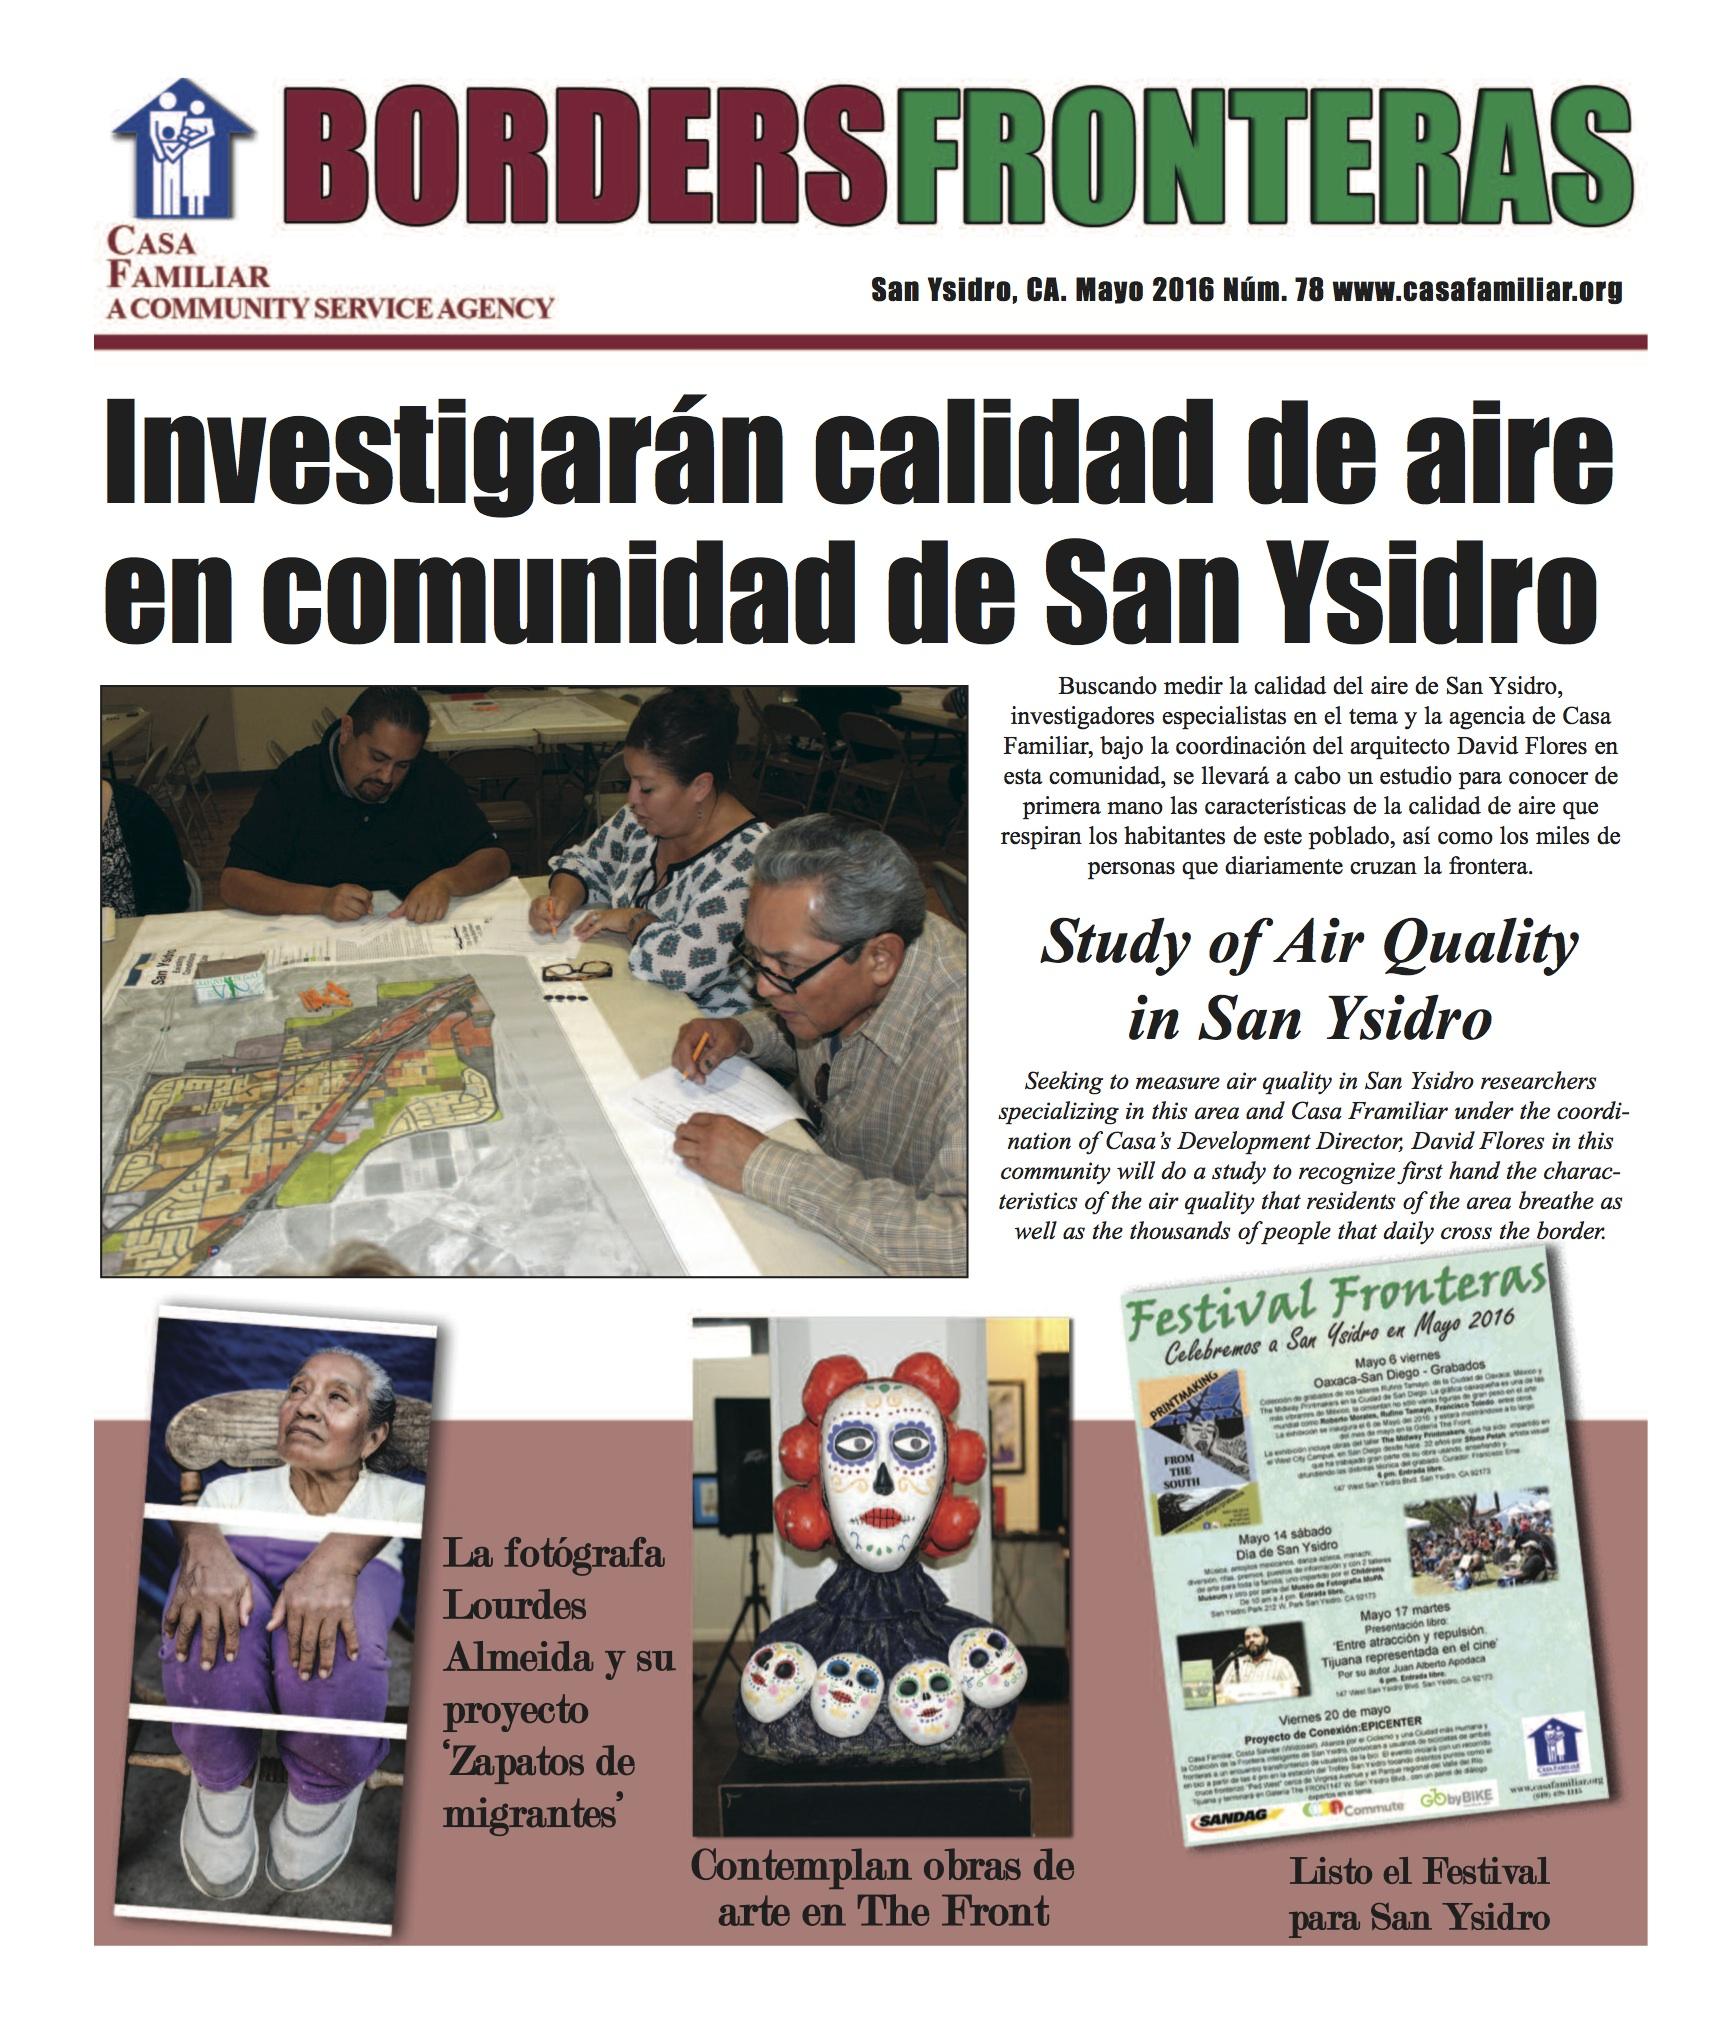 Border/Fronteras Newspaper May 2016